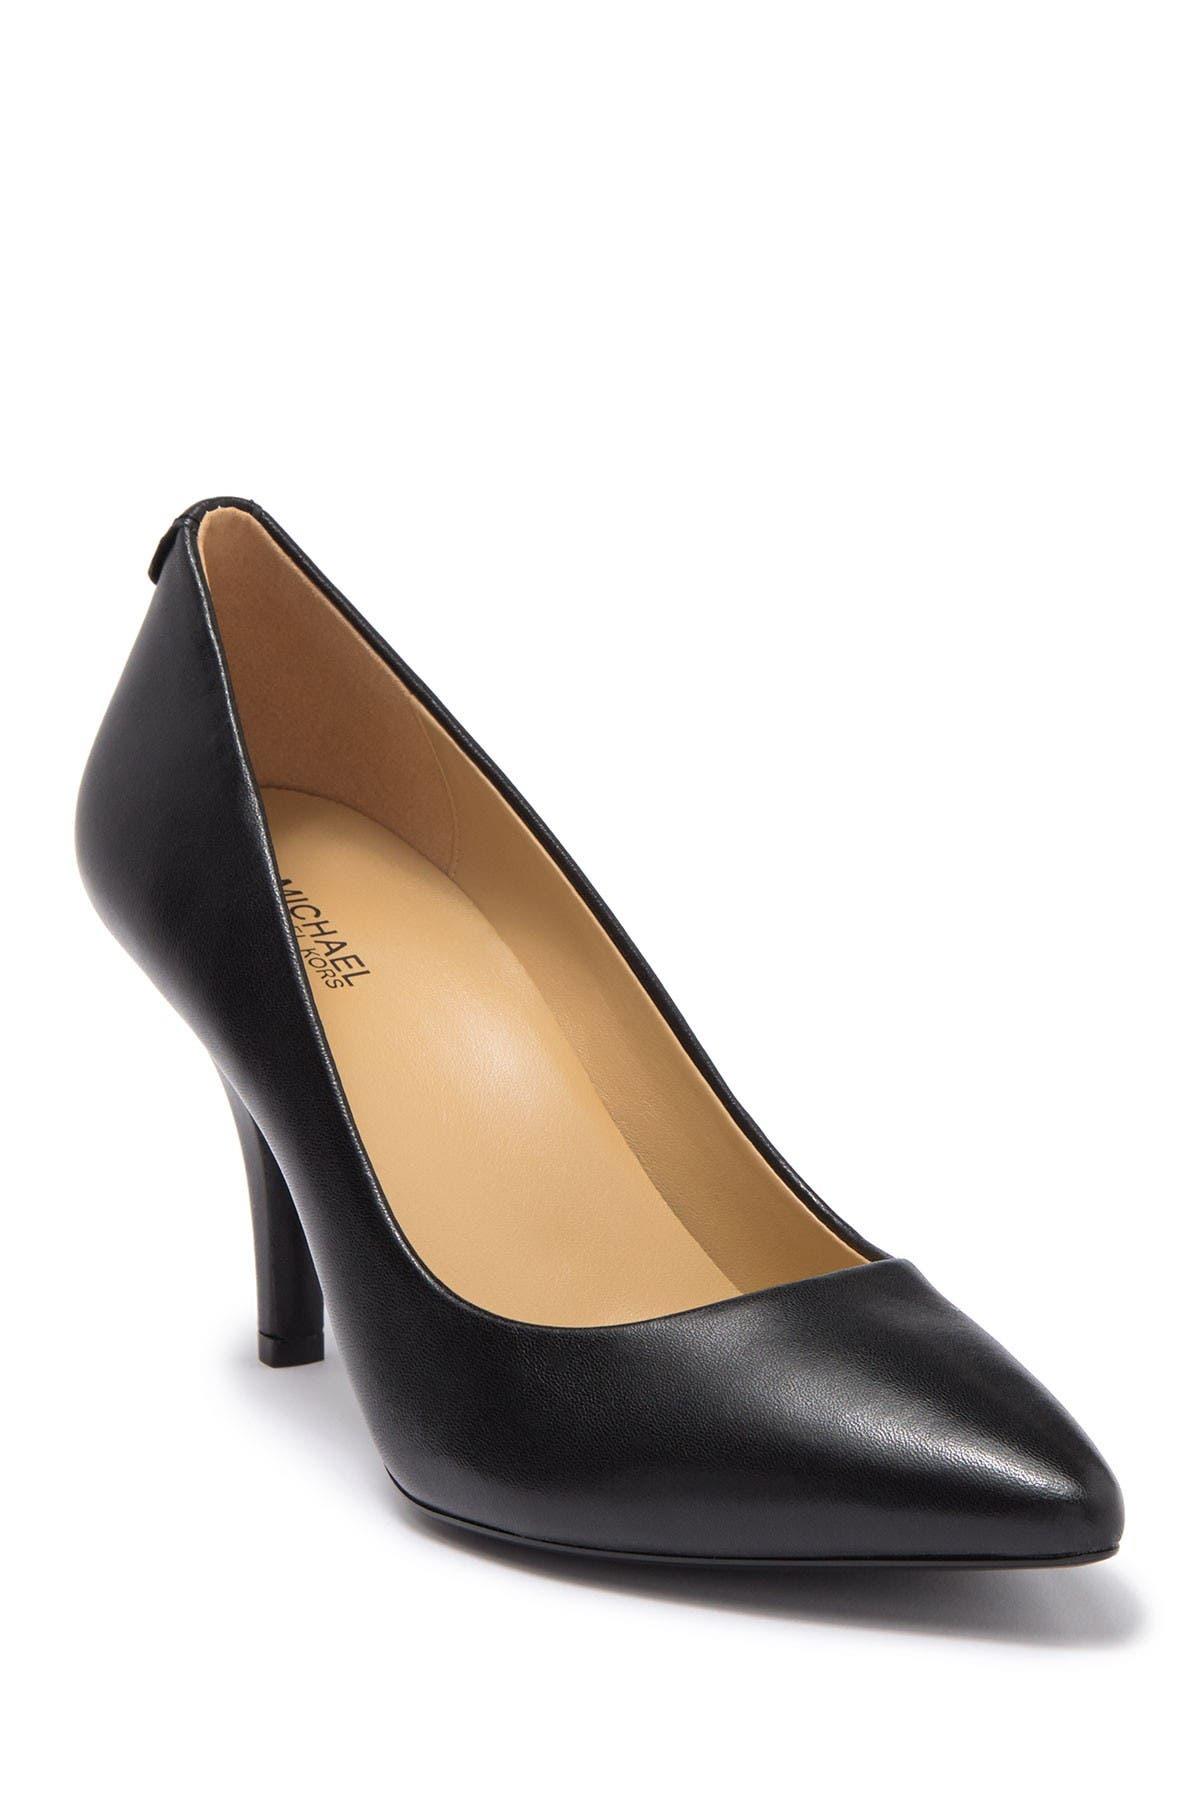 michael kors womens heels